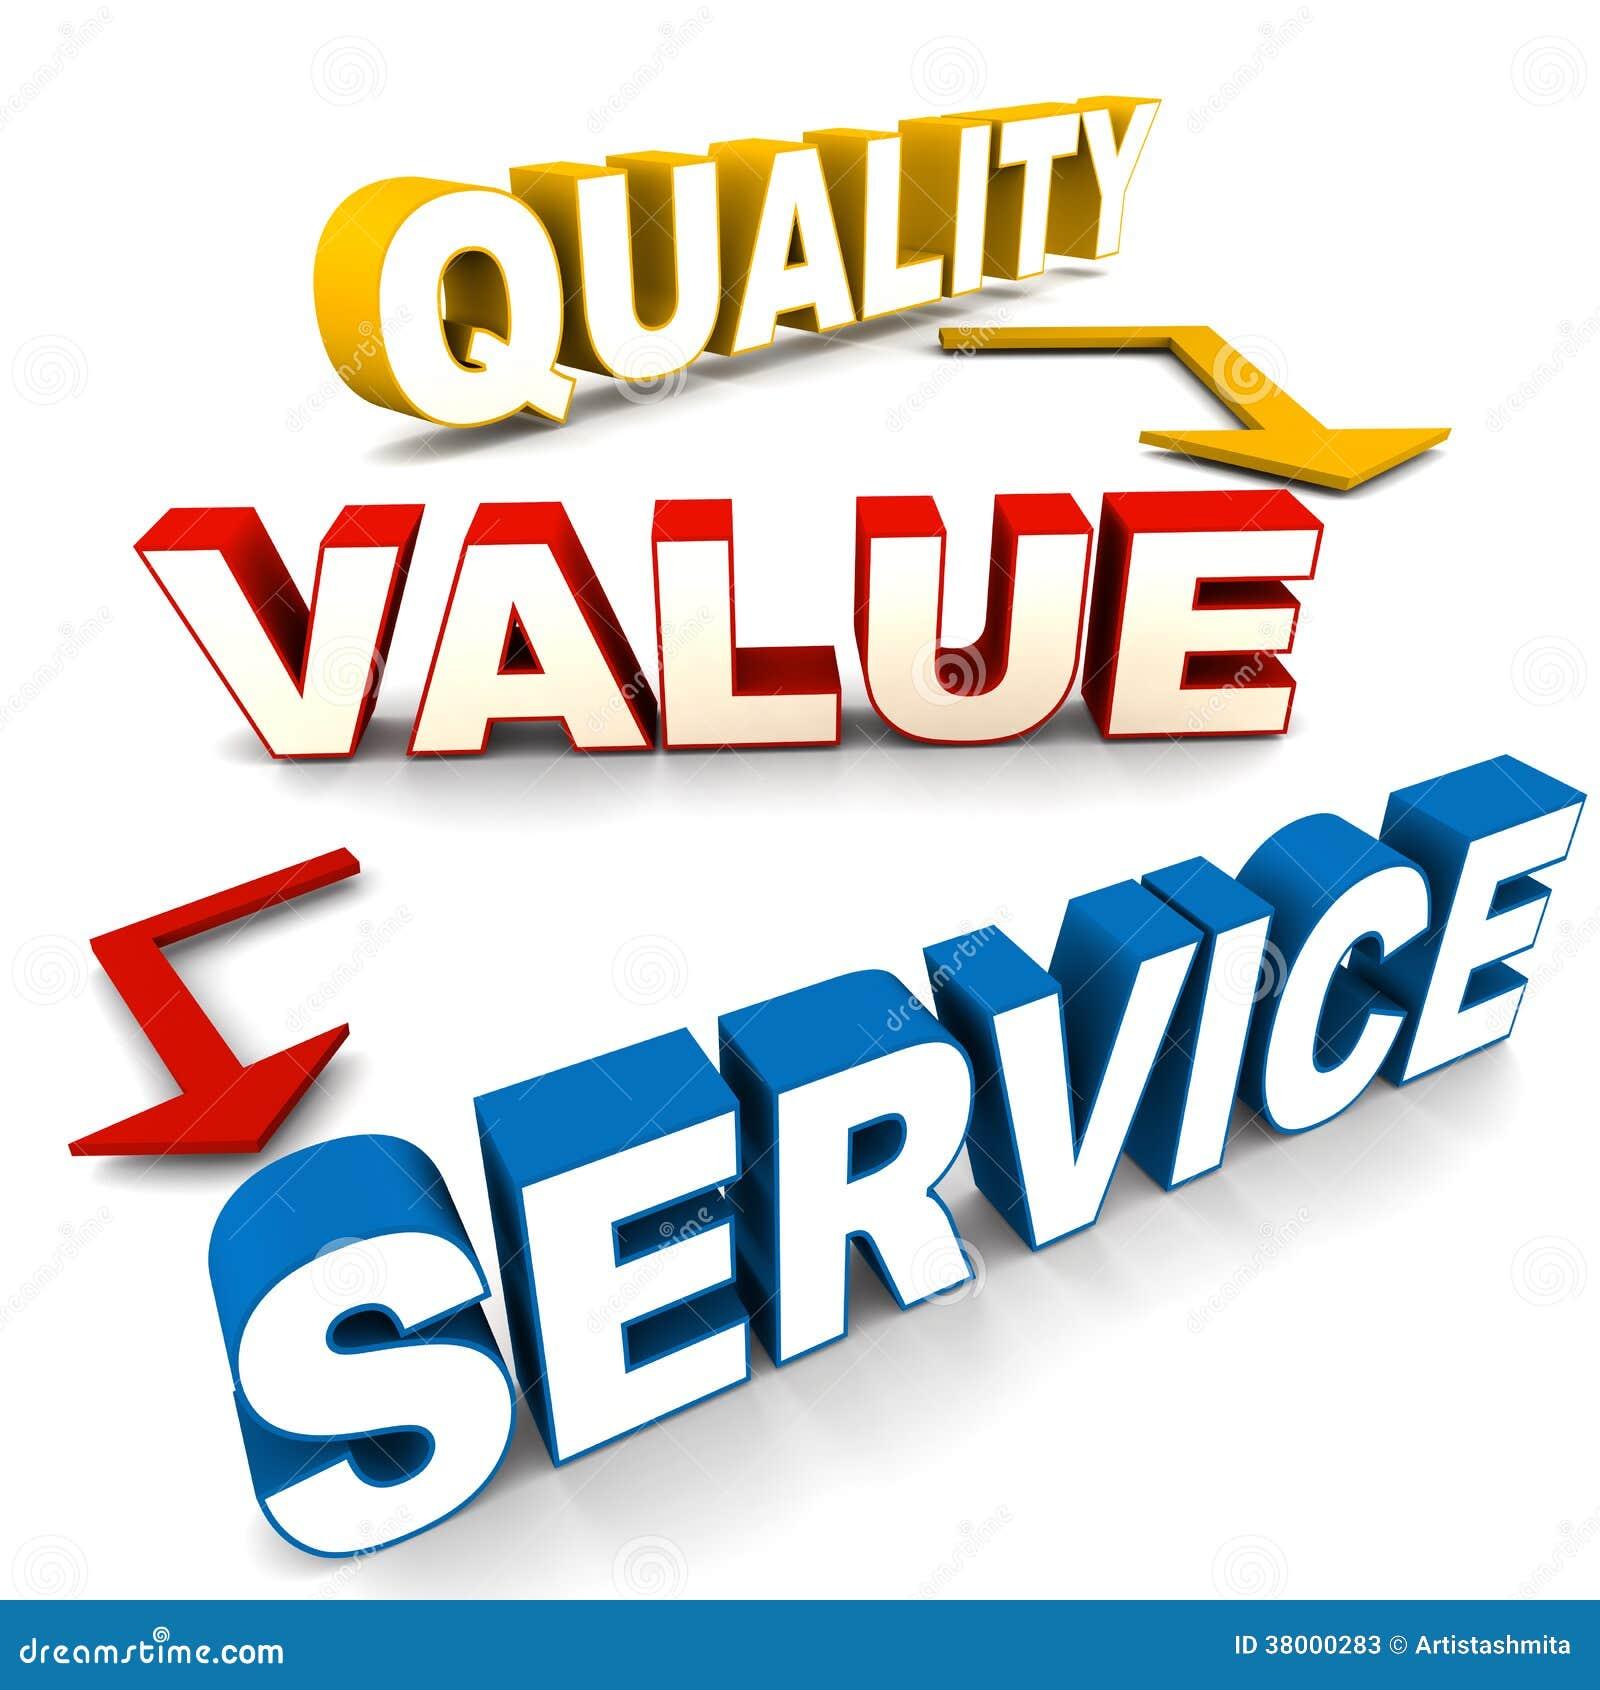 Quality Value Service Stock Photos